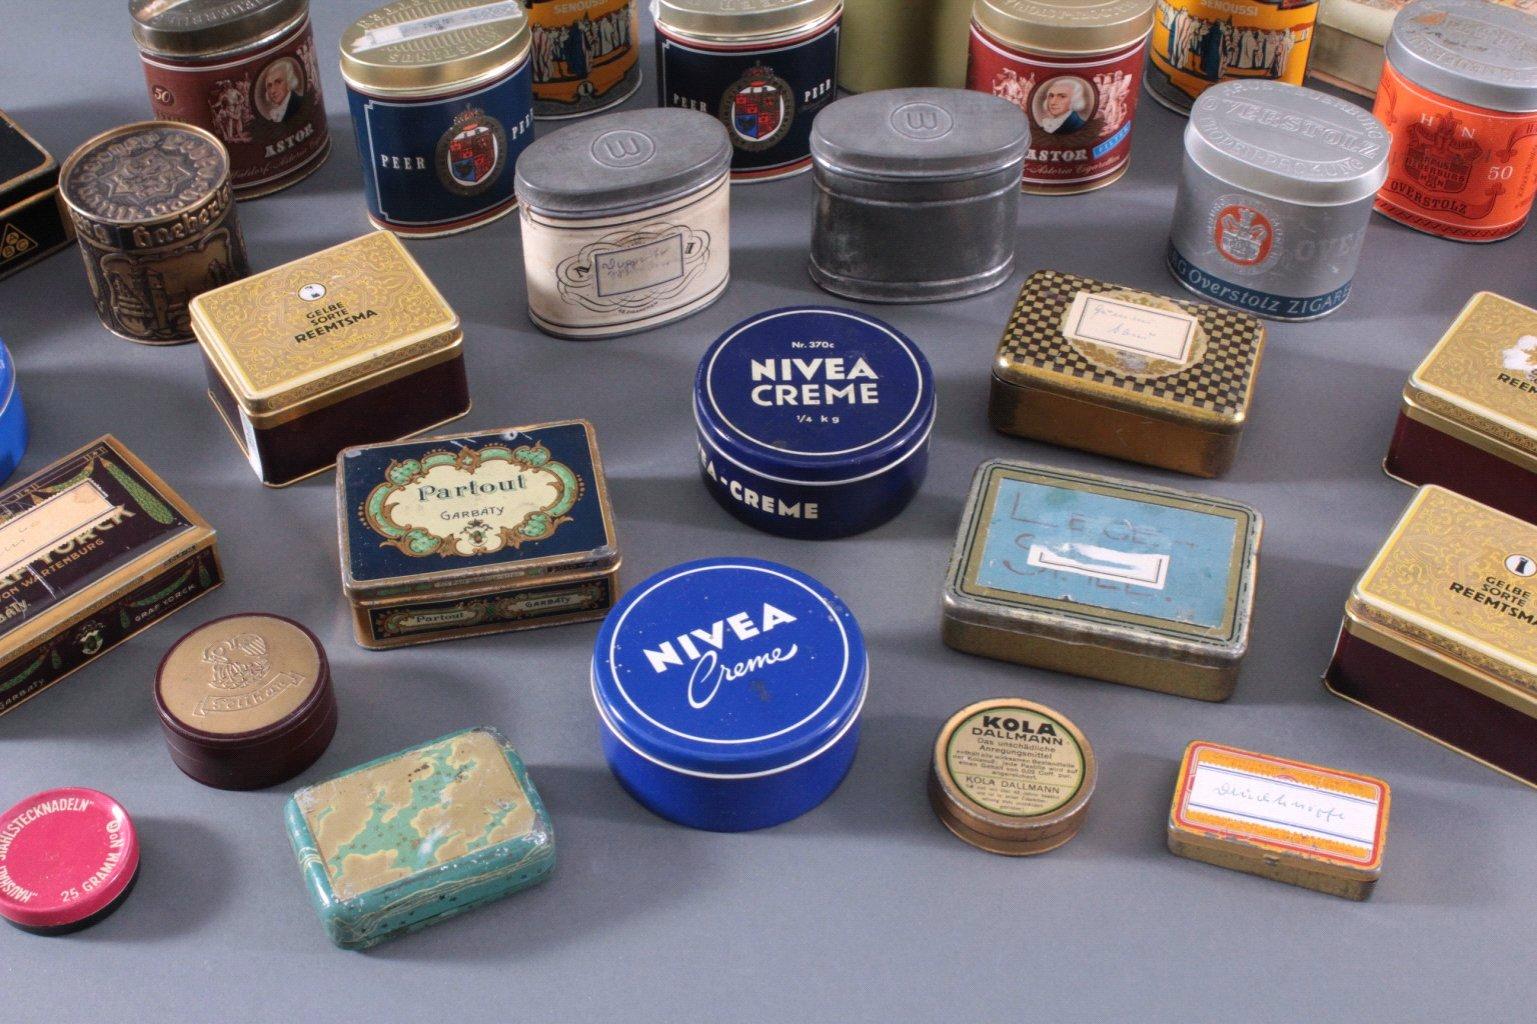 Sammlung Blechdosen und Pappschachteln-4